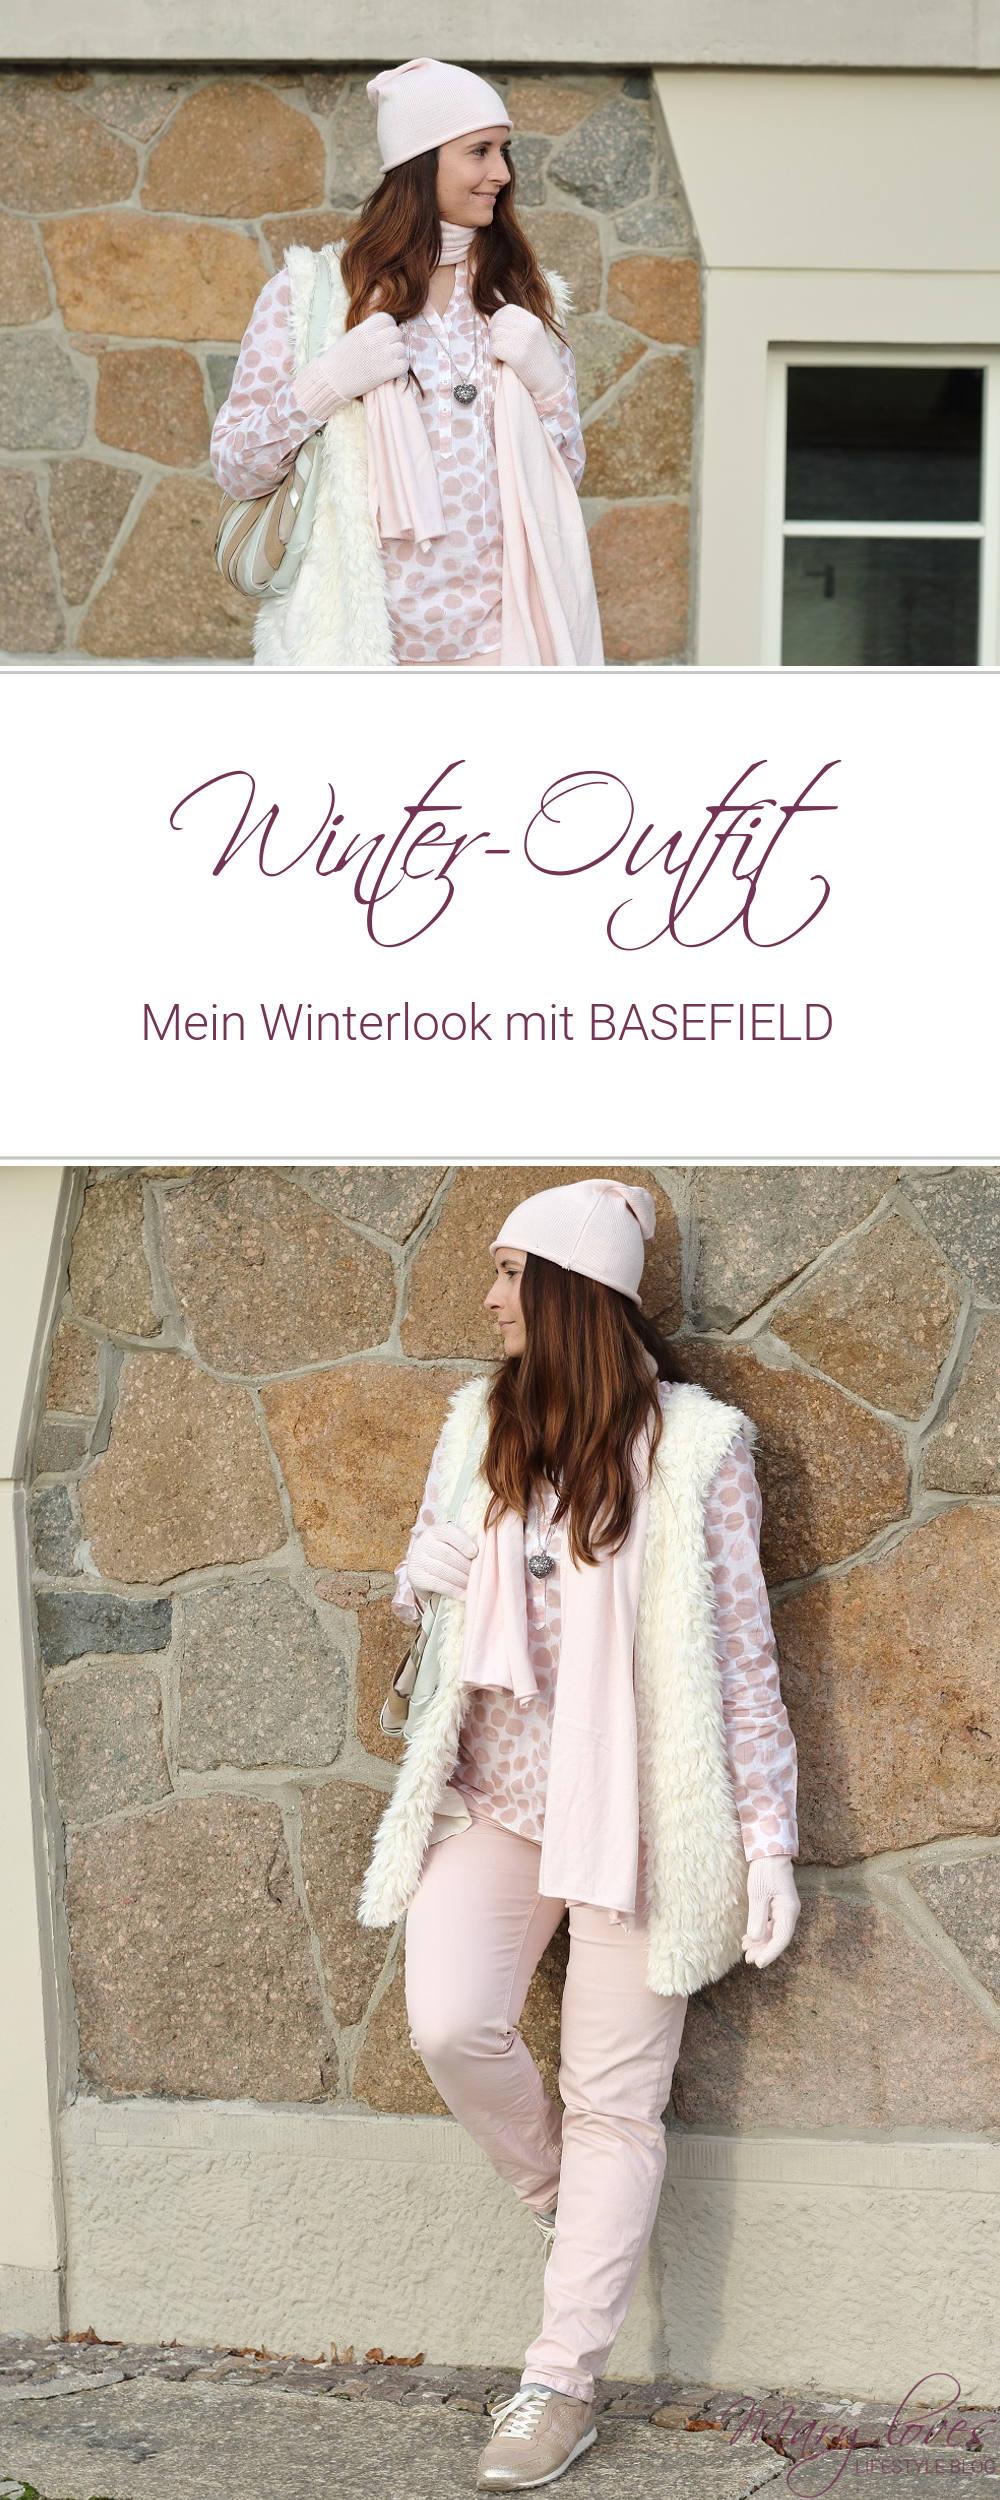 [Outfit] Mein Winterlook mit BASEFIELD